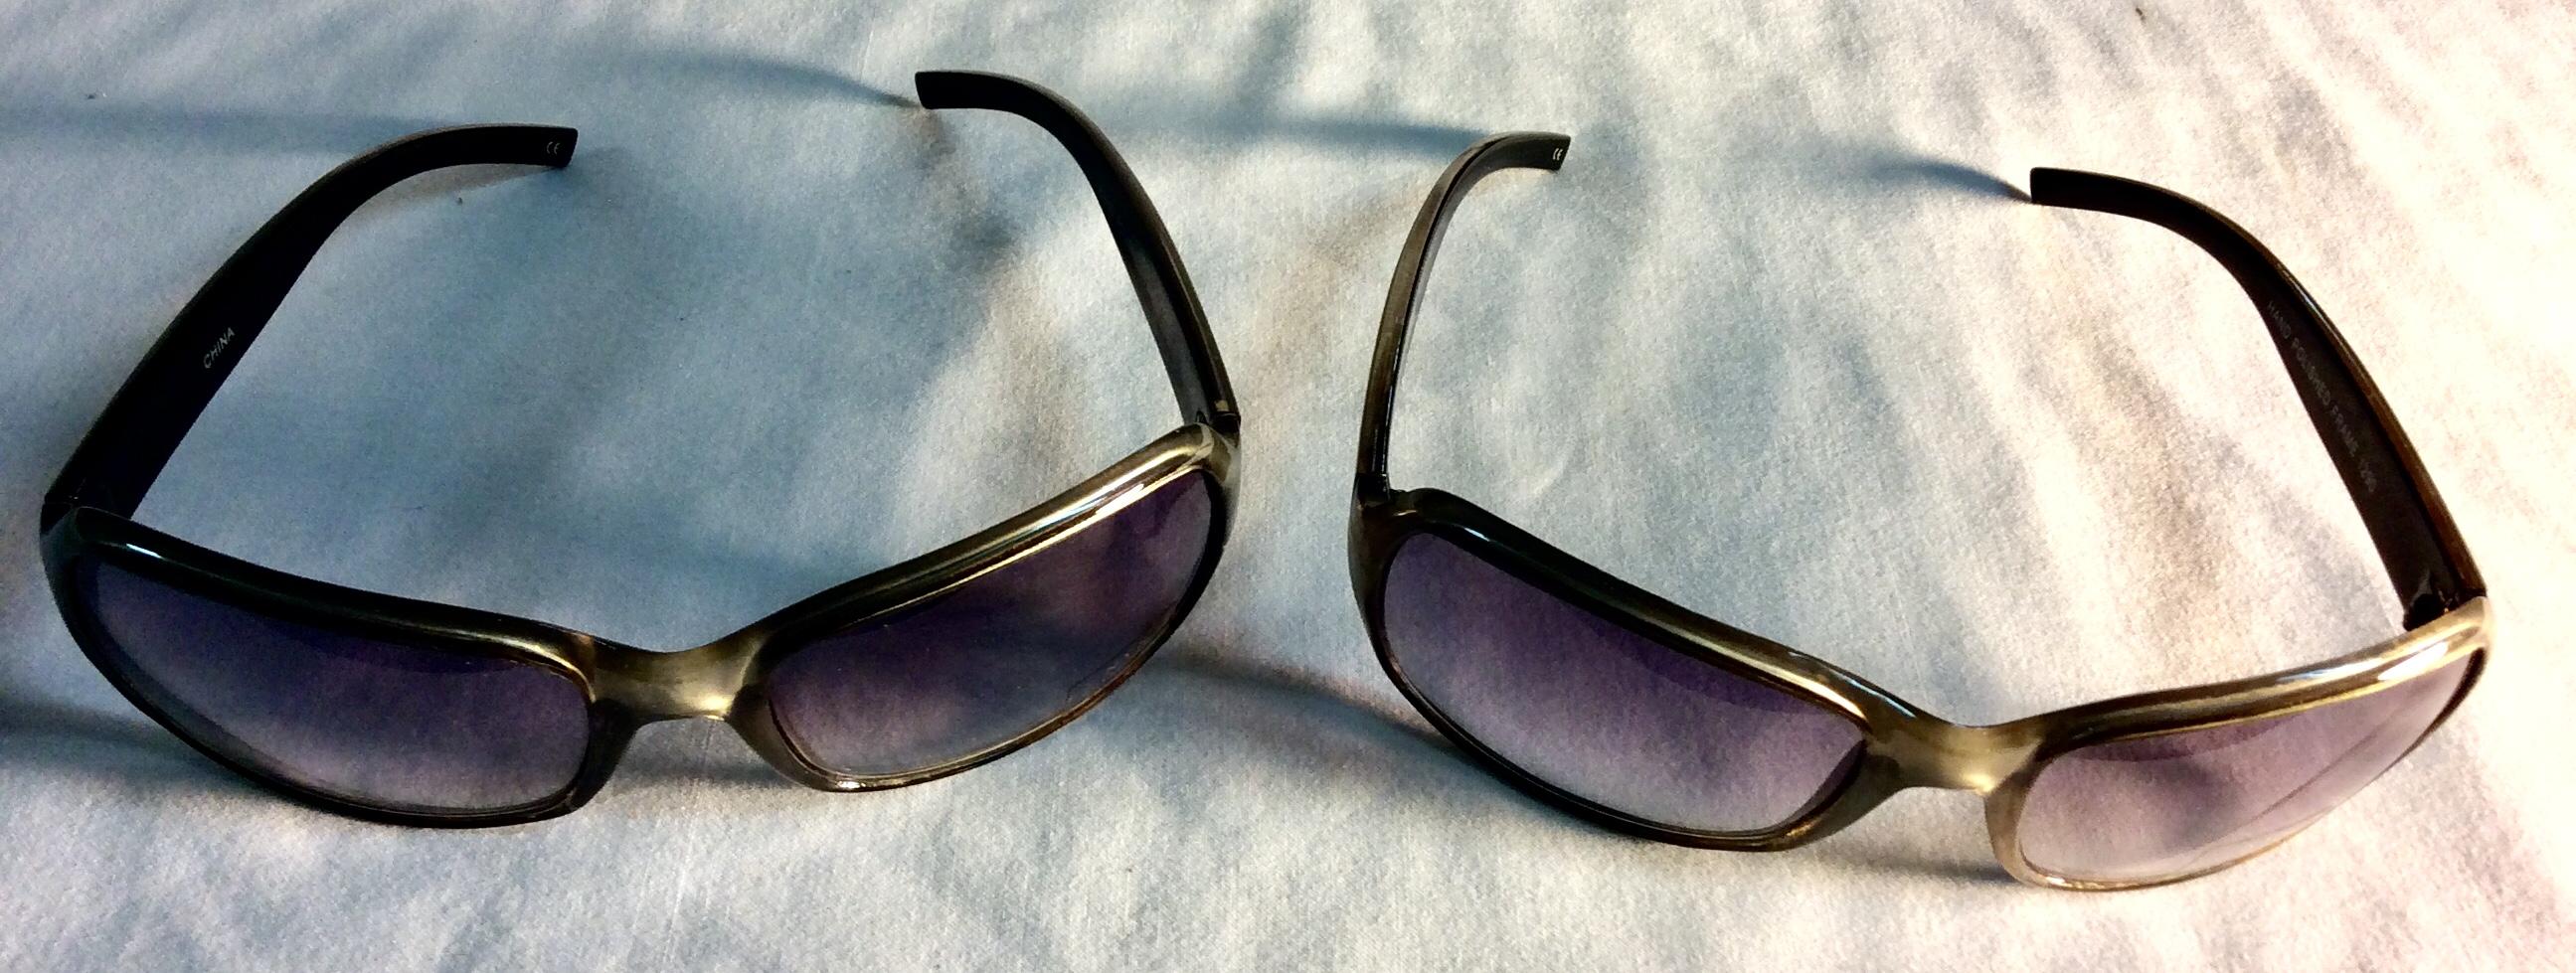 Silver frame, plastic sunglasses